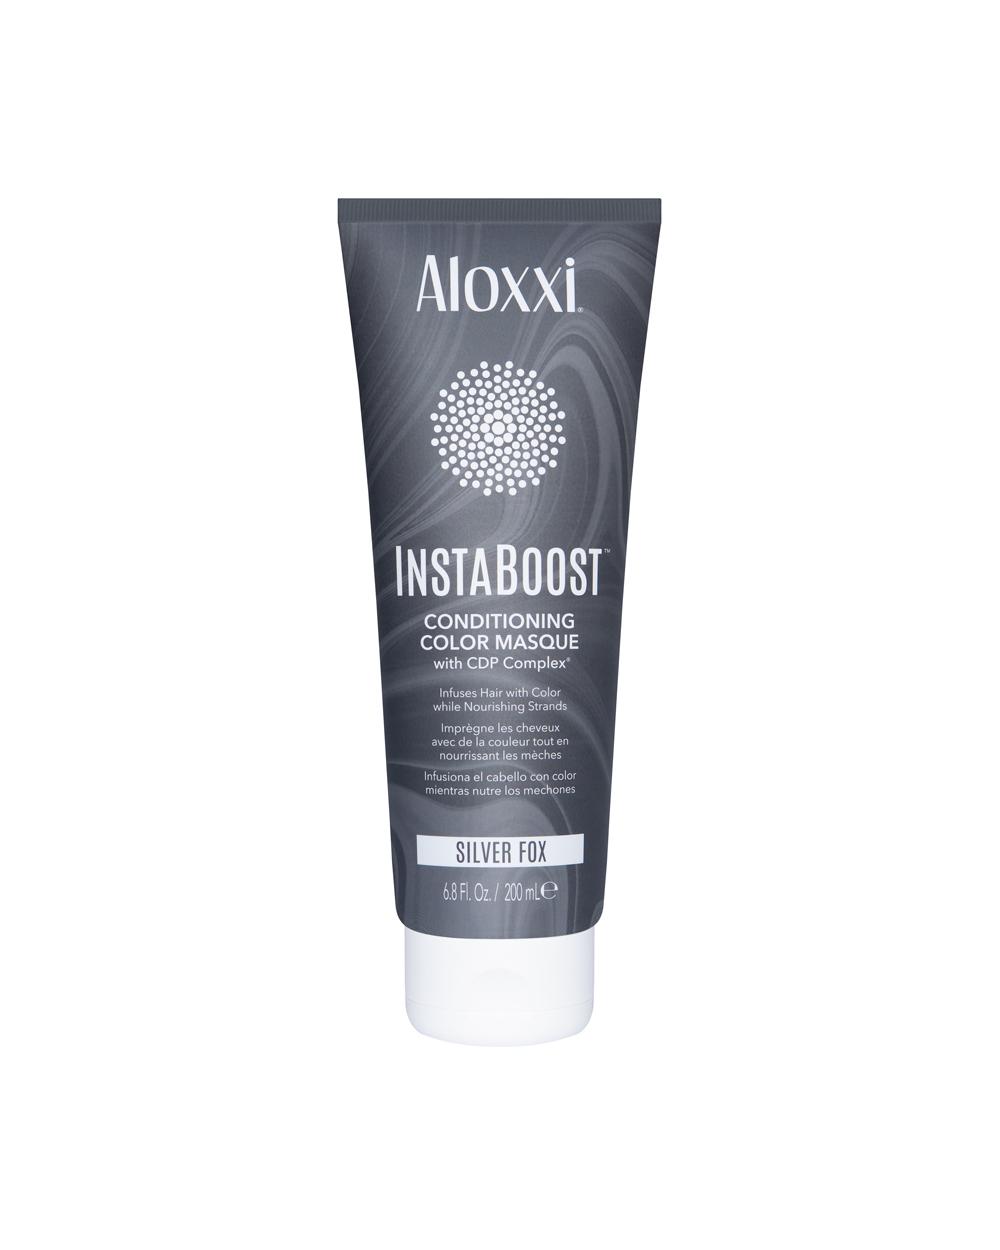 Aloxxi-Master-Silver-Fox.jpg